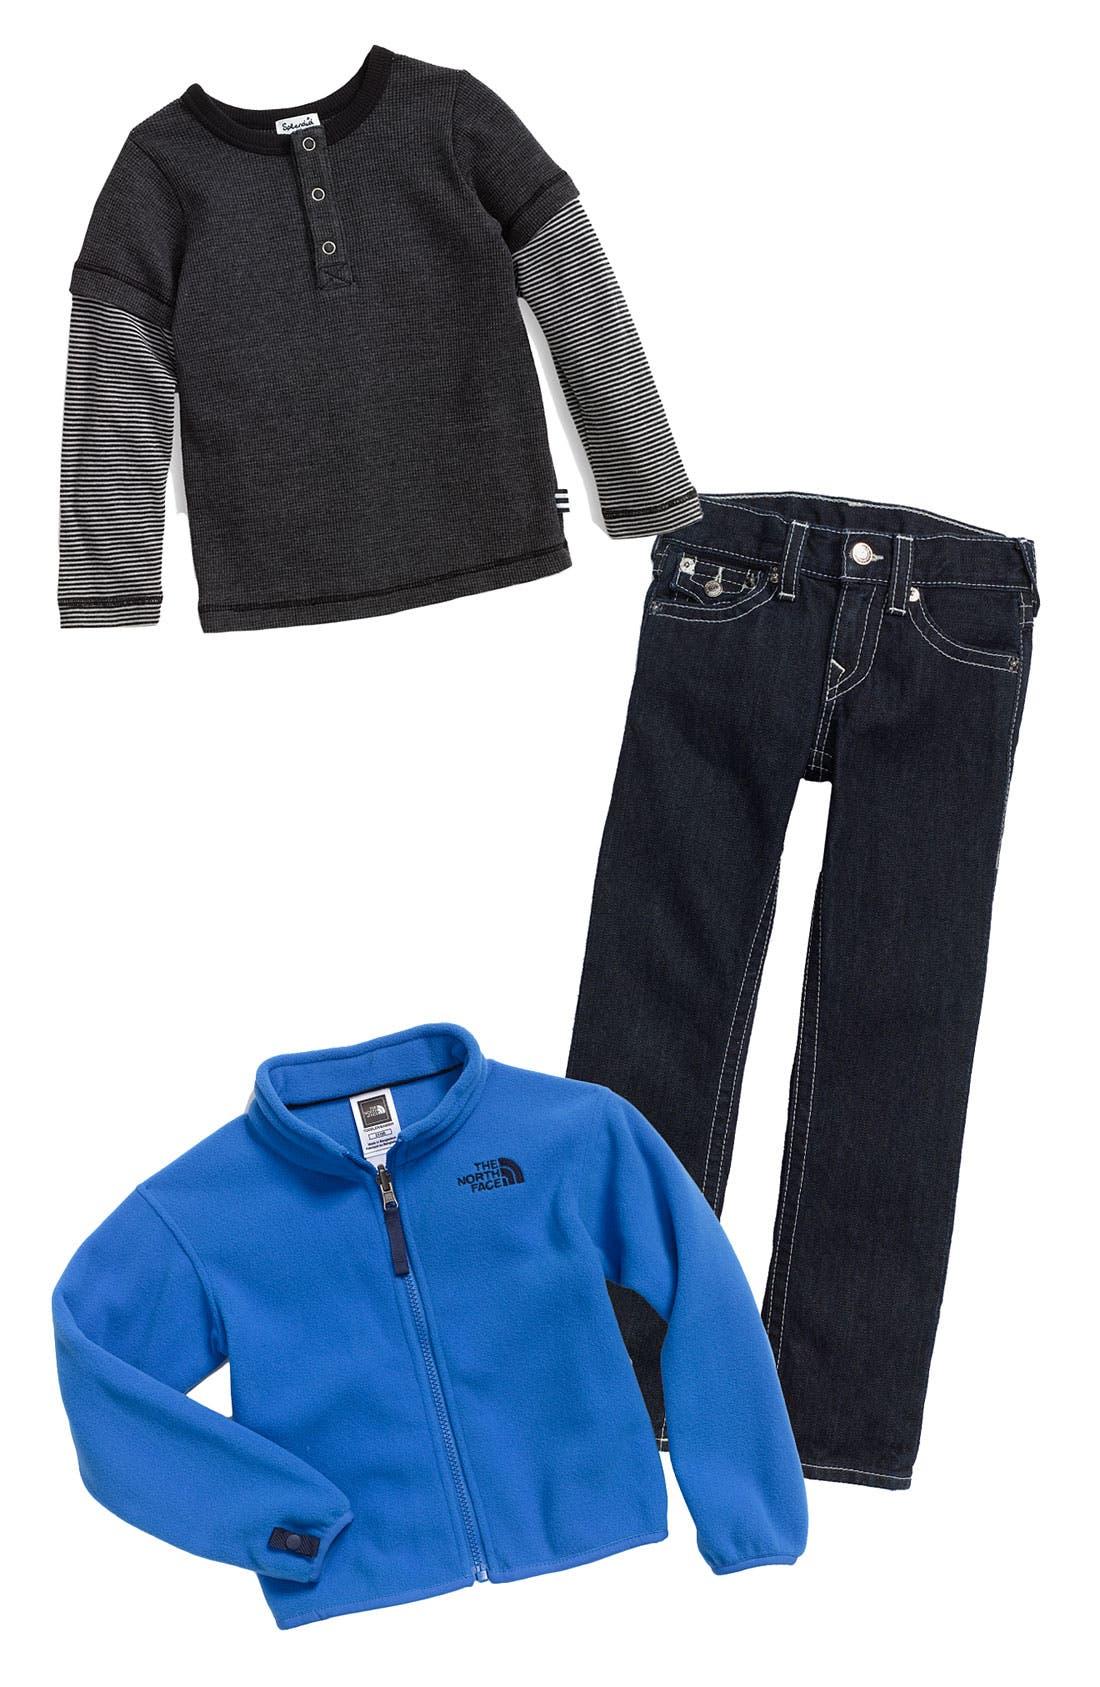 Main Image - The North Face Jacket, Splendid Henley & True Religion Brand Jeans Straight Leg Jeans (Toddler)